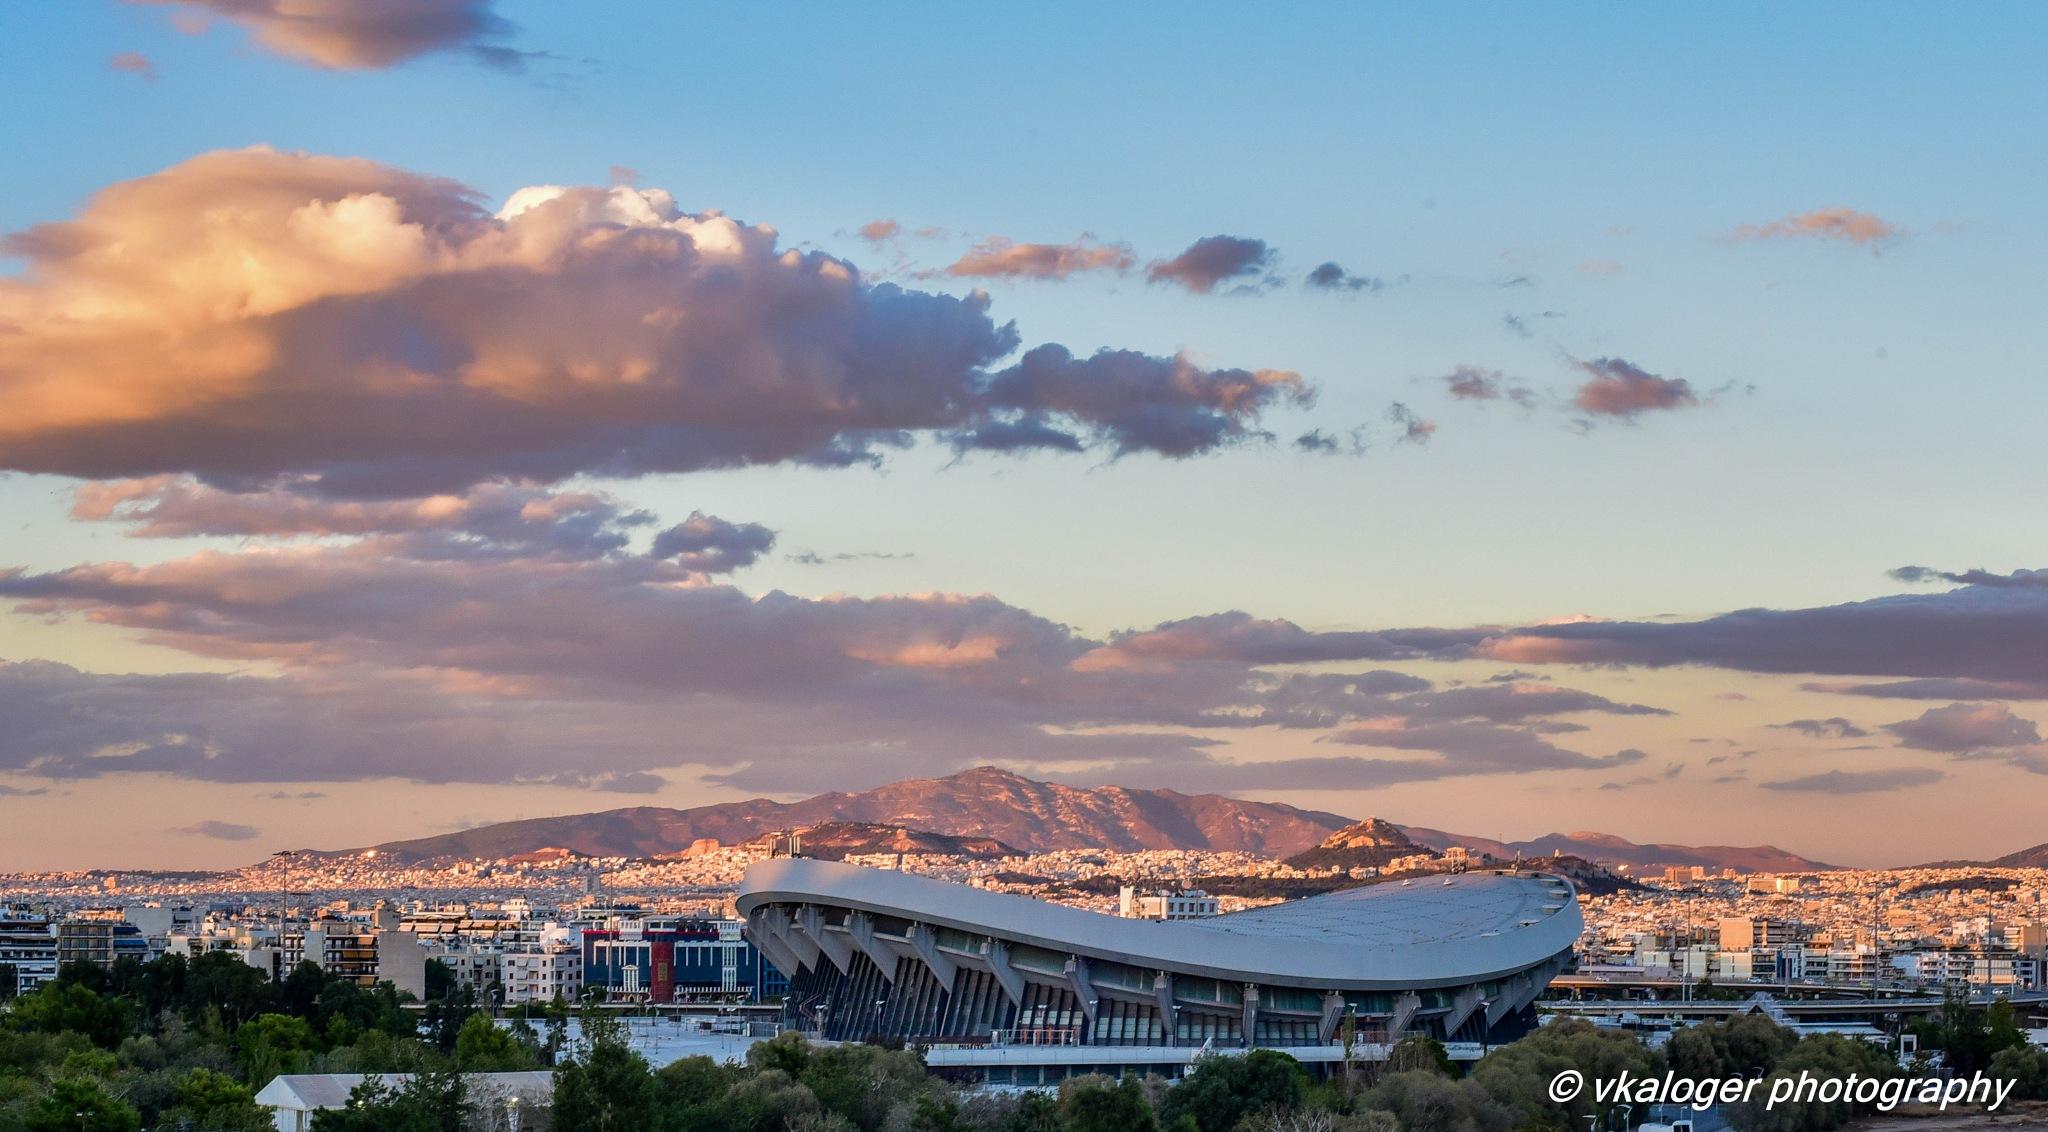 Stadium Peace and Frienship by Vasilis Kalogeropoulos